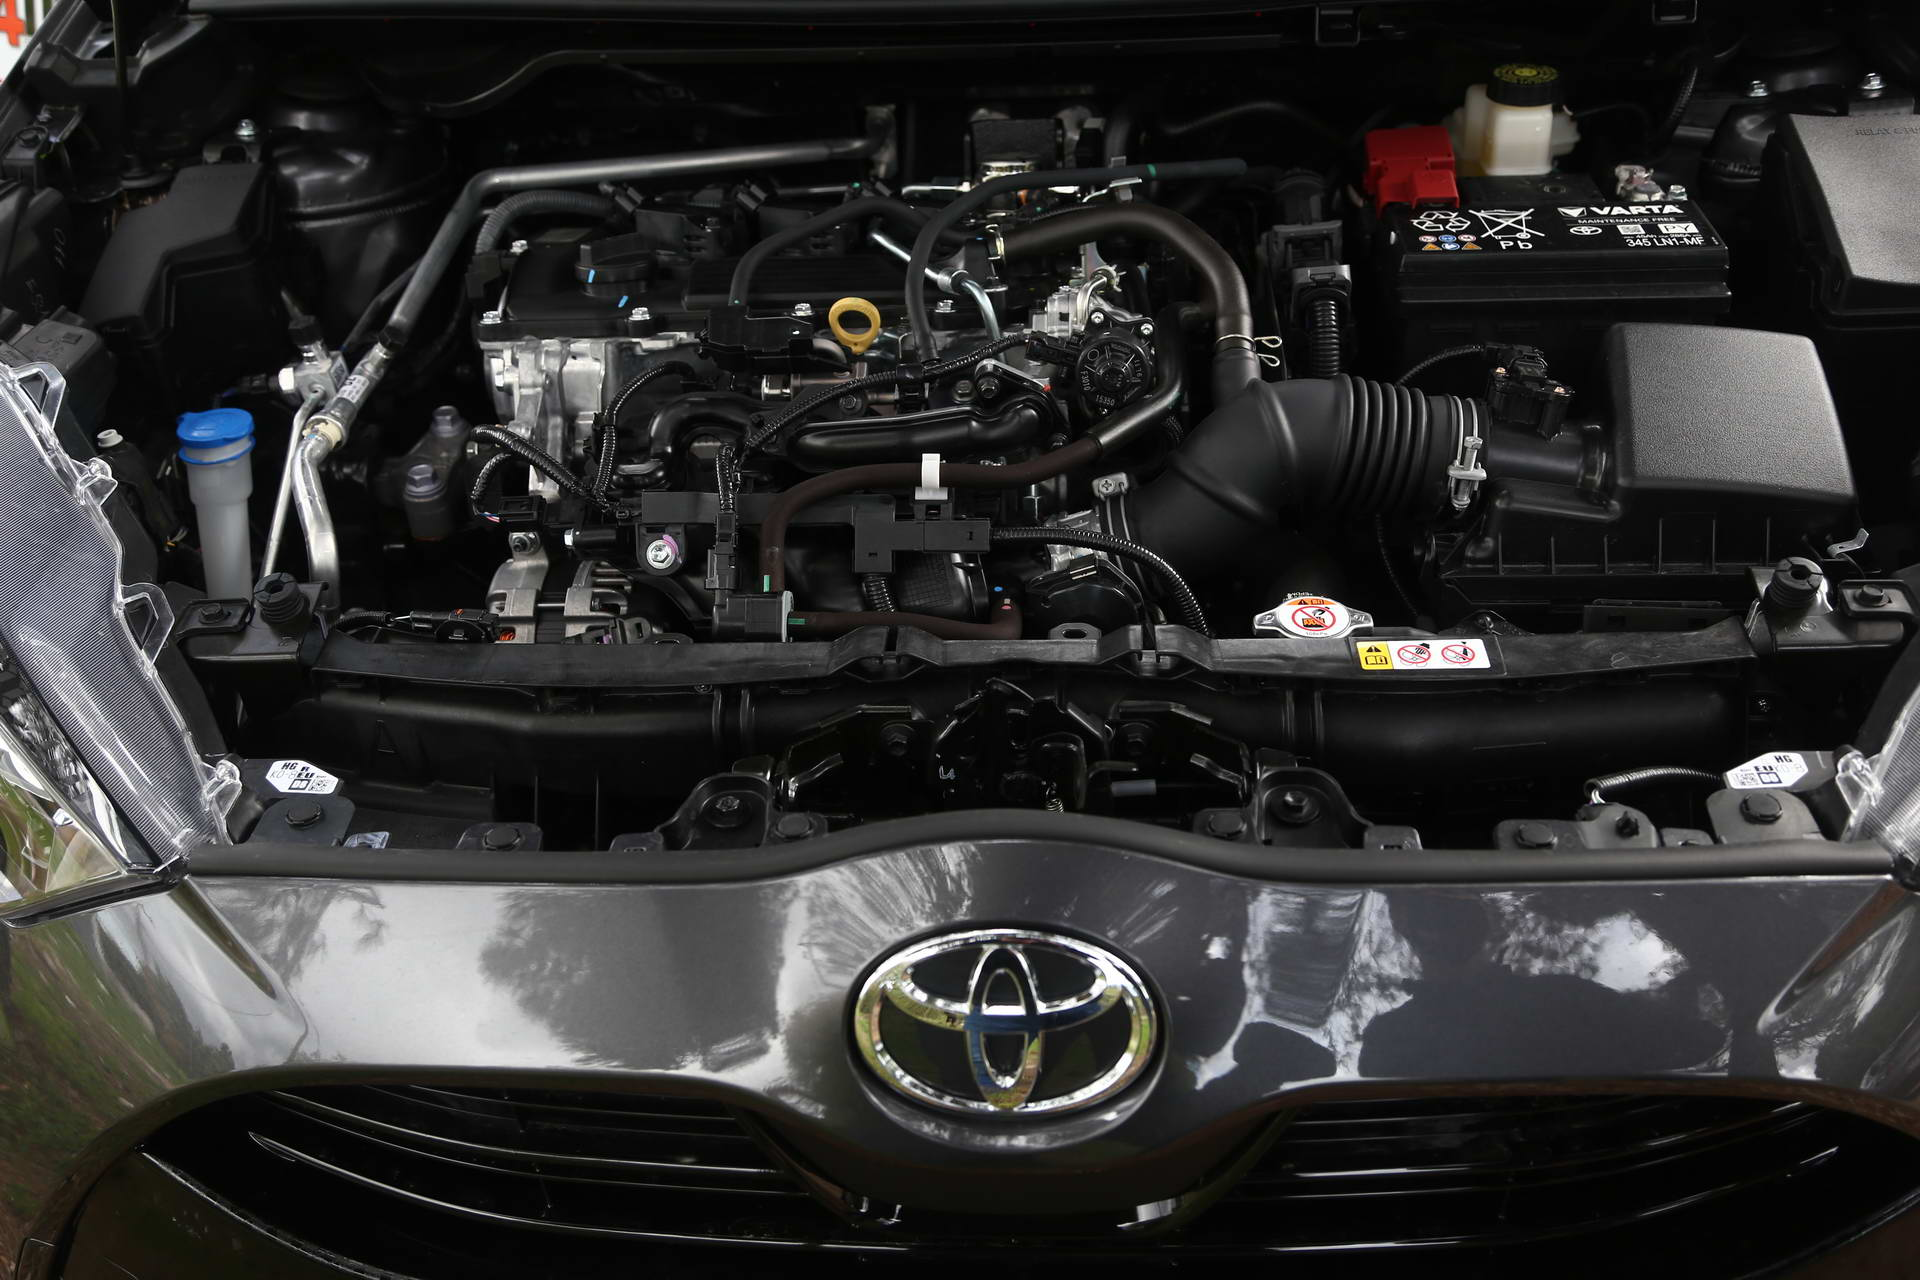 Toyota Yaris 1.5 125 ps